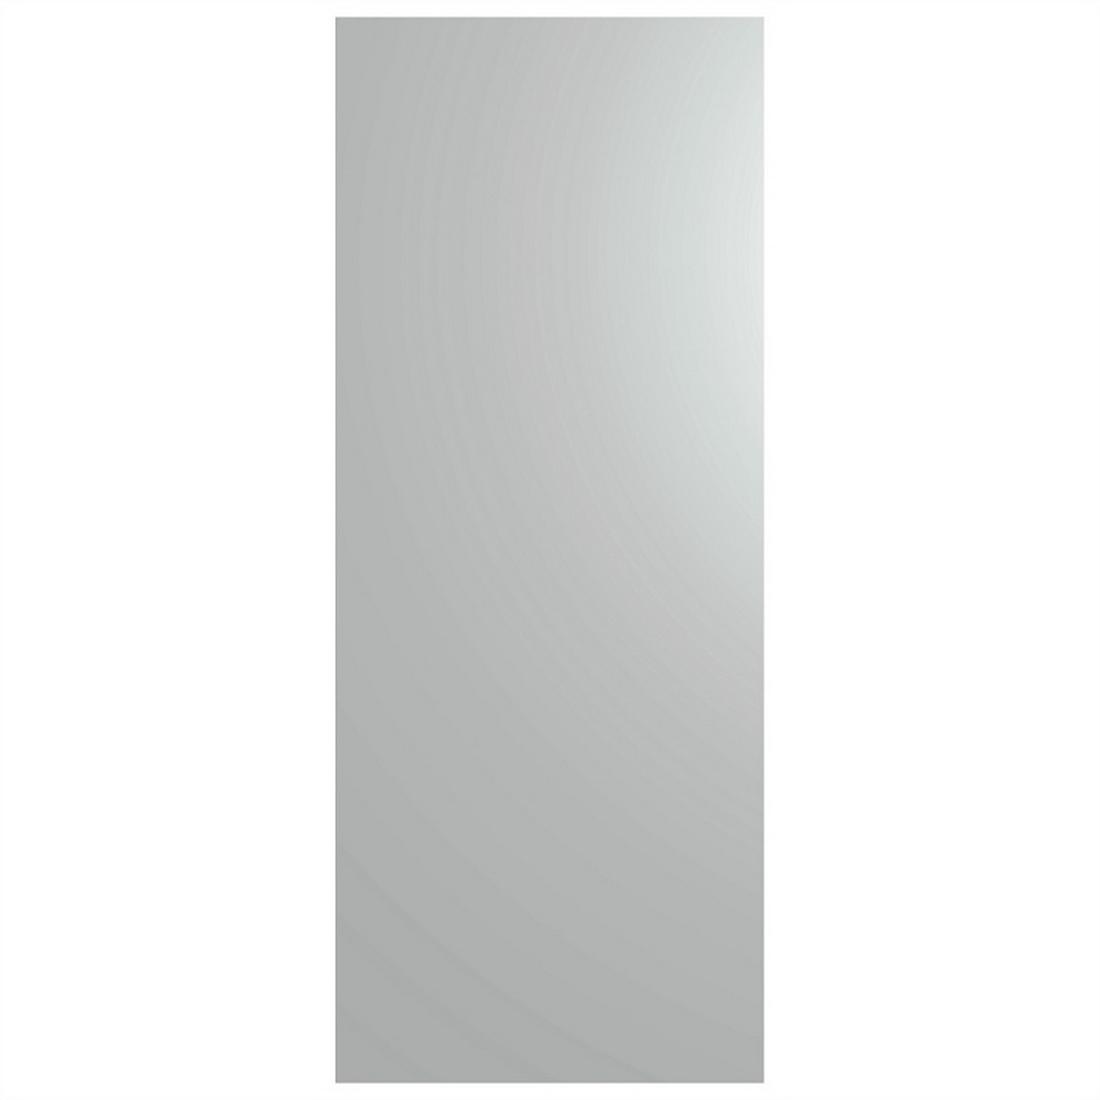 Doors Prime Coat Flush Interior Door 1980 x 760 x 35mm Honeycomb Core Pre-Primed MDF Skin PCM760